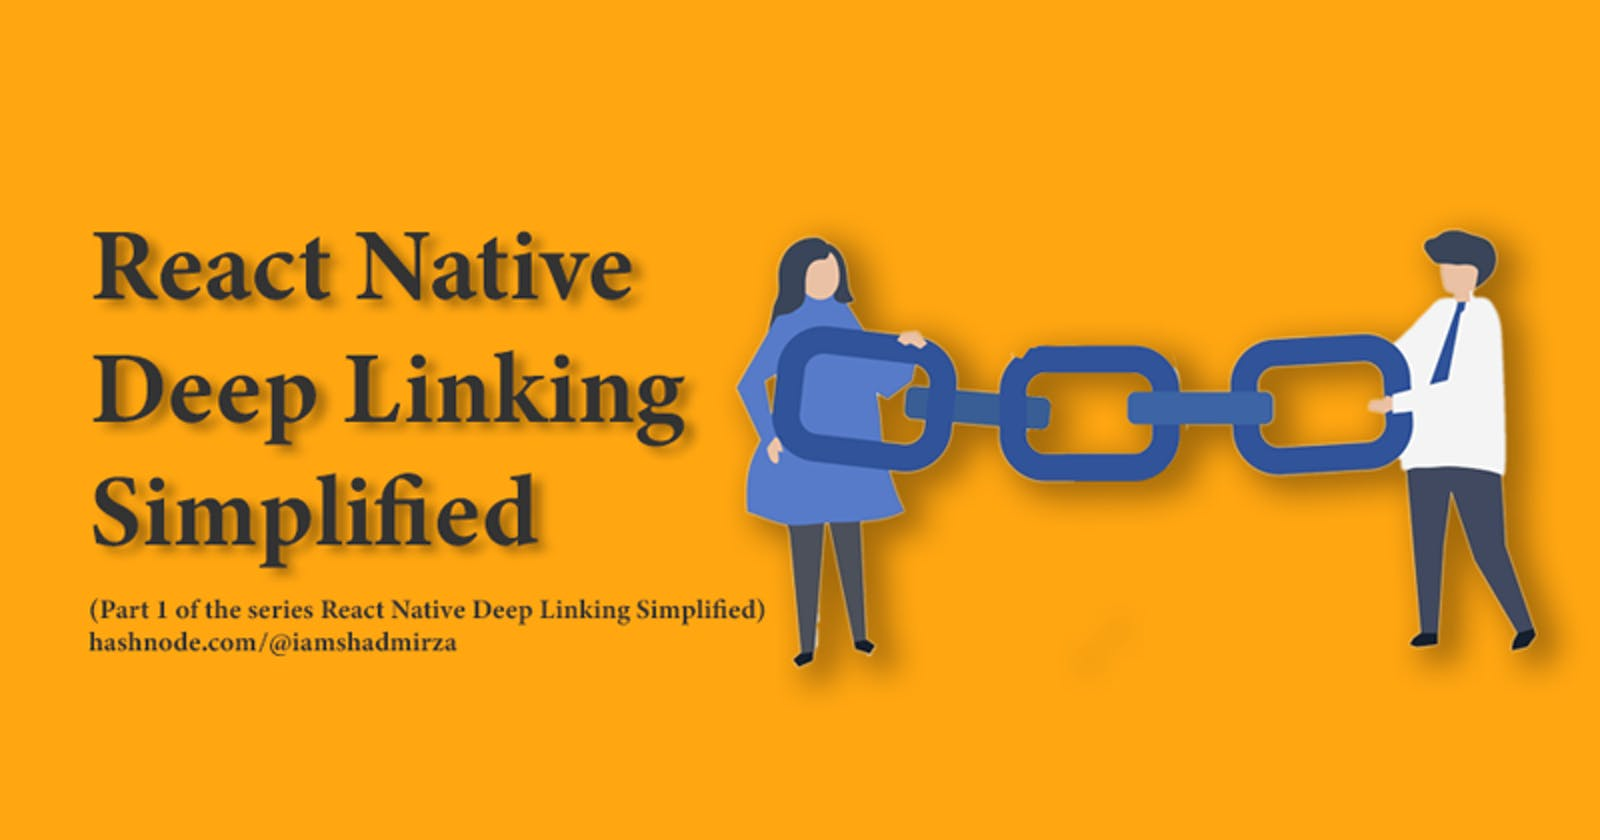 React Native Deep Linking Simplified